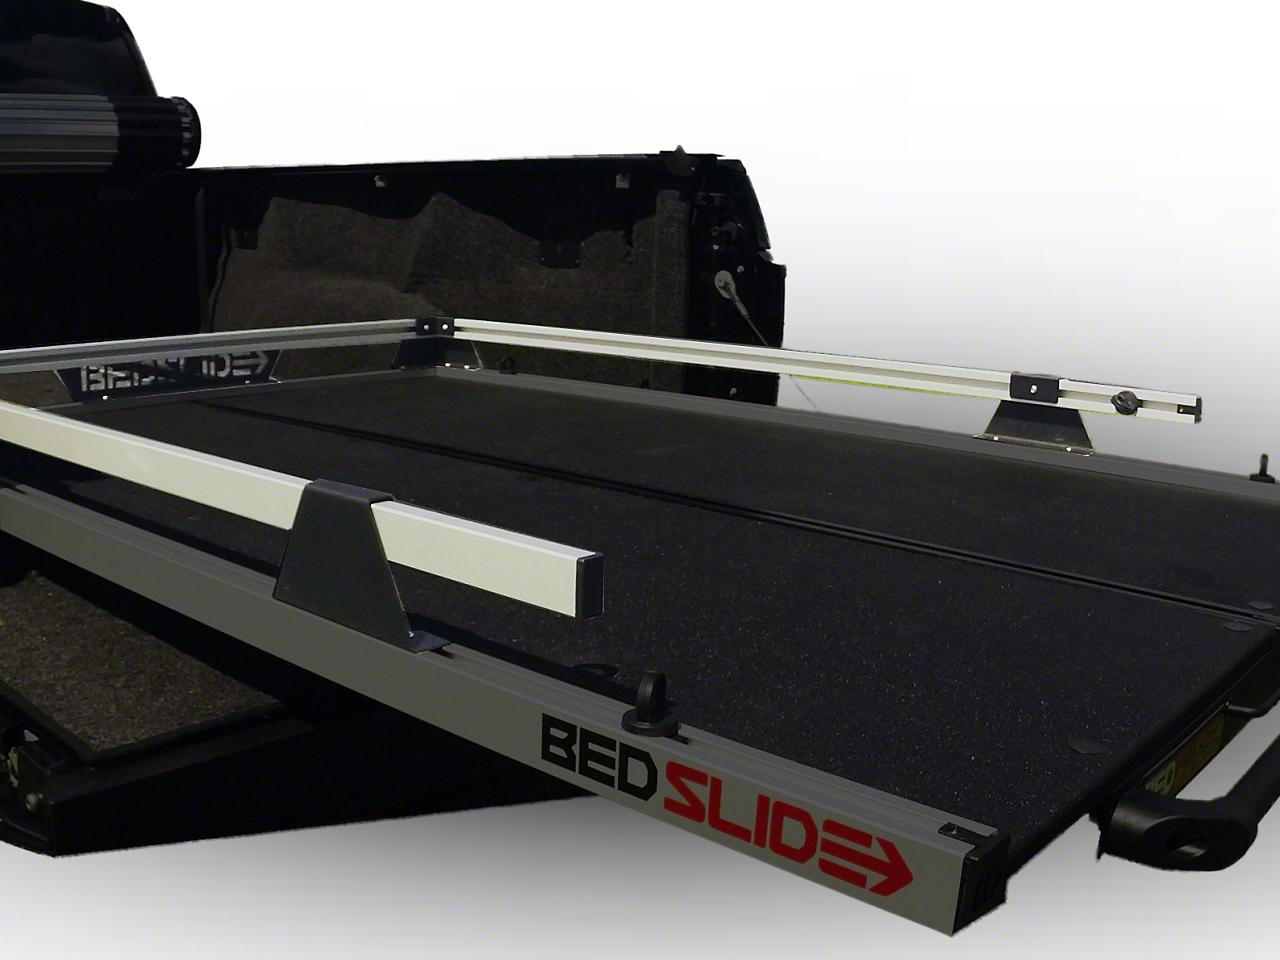 Bedslide S Model Bed Cargo Slide (07-18 Sierra 1500)